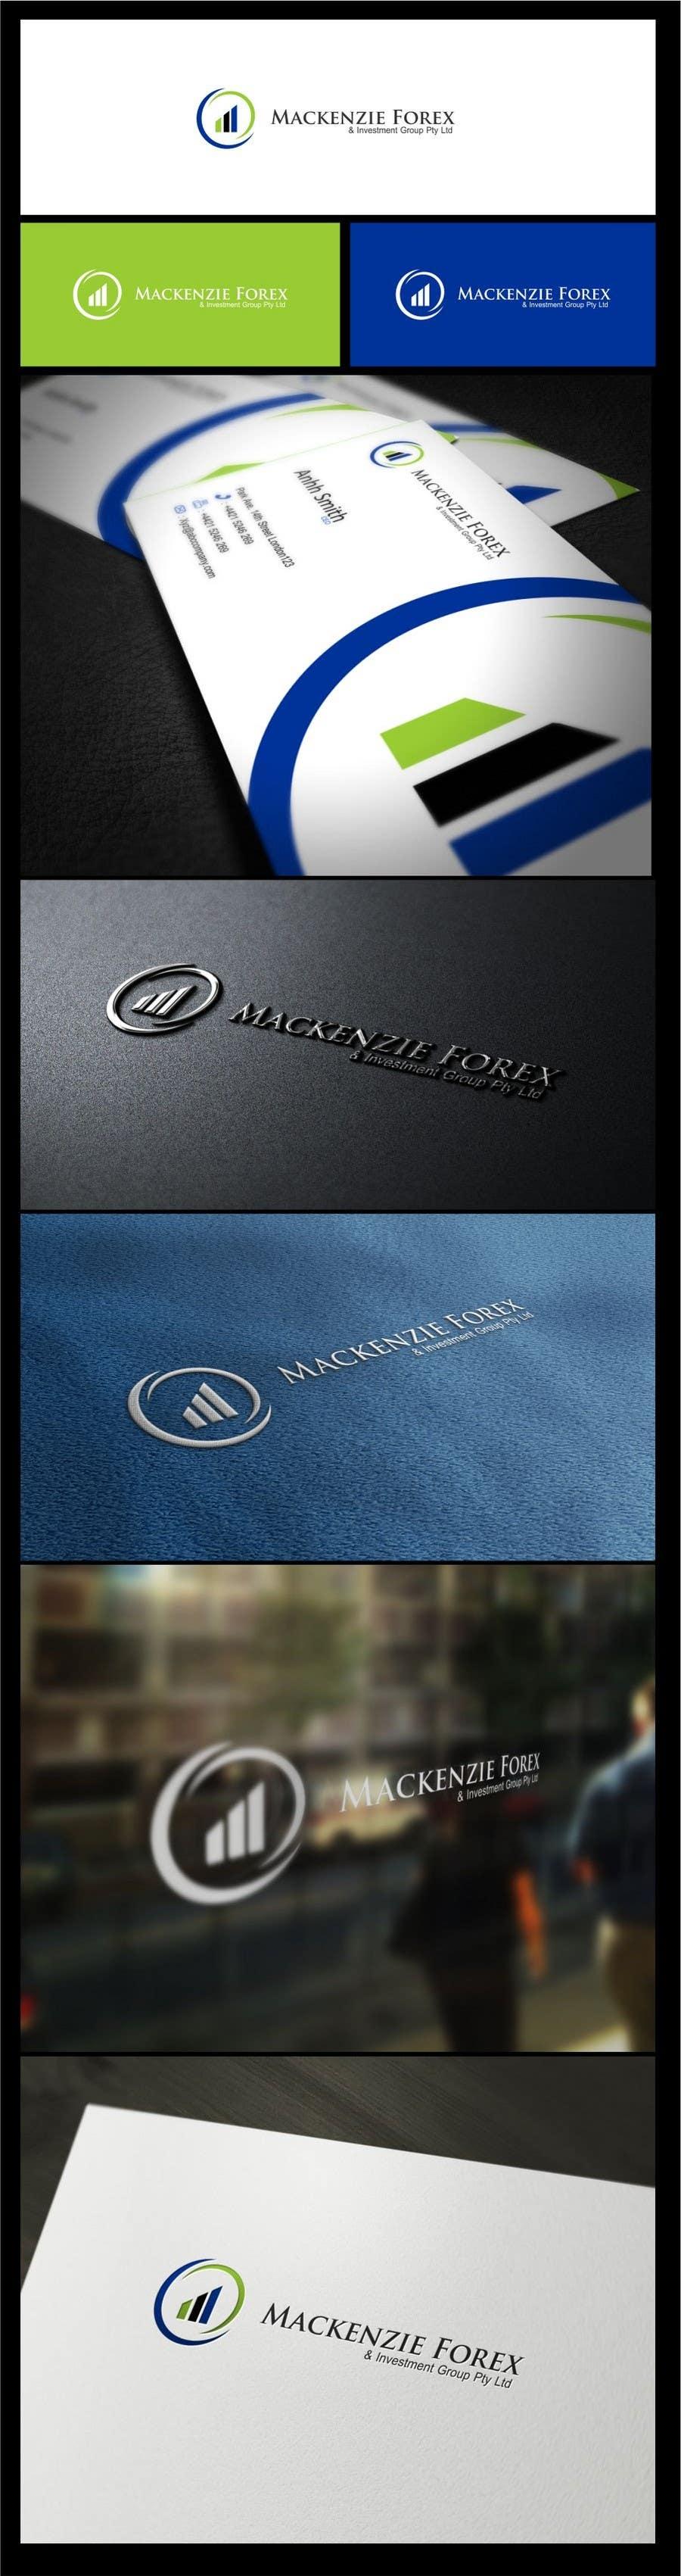 Konkurrenceindlæg #                                        128                                      for                                         Logo Design for Mackenzie Forex & Investment Group Pty Ltd